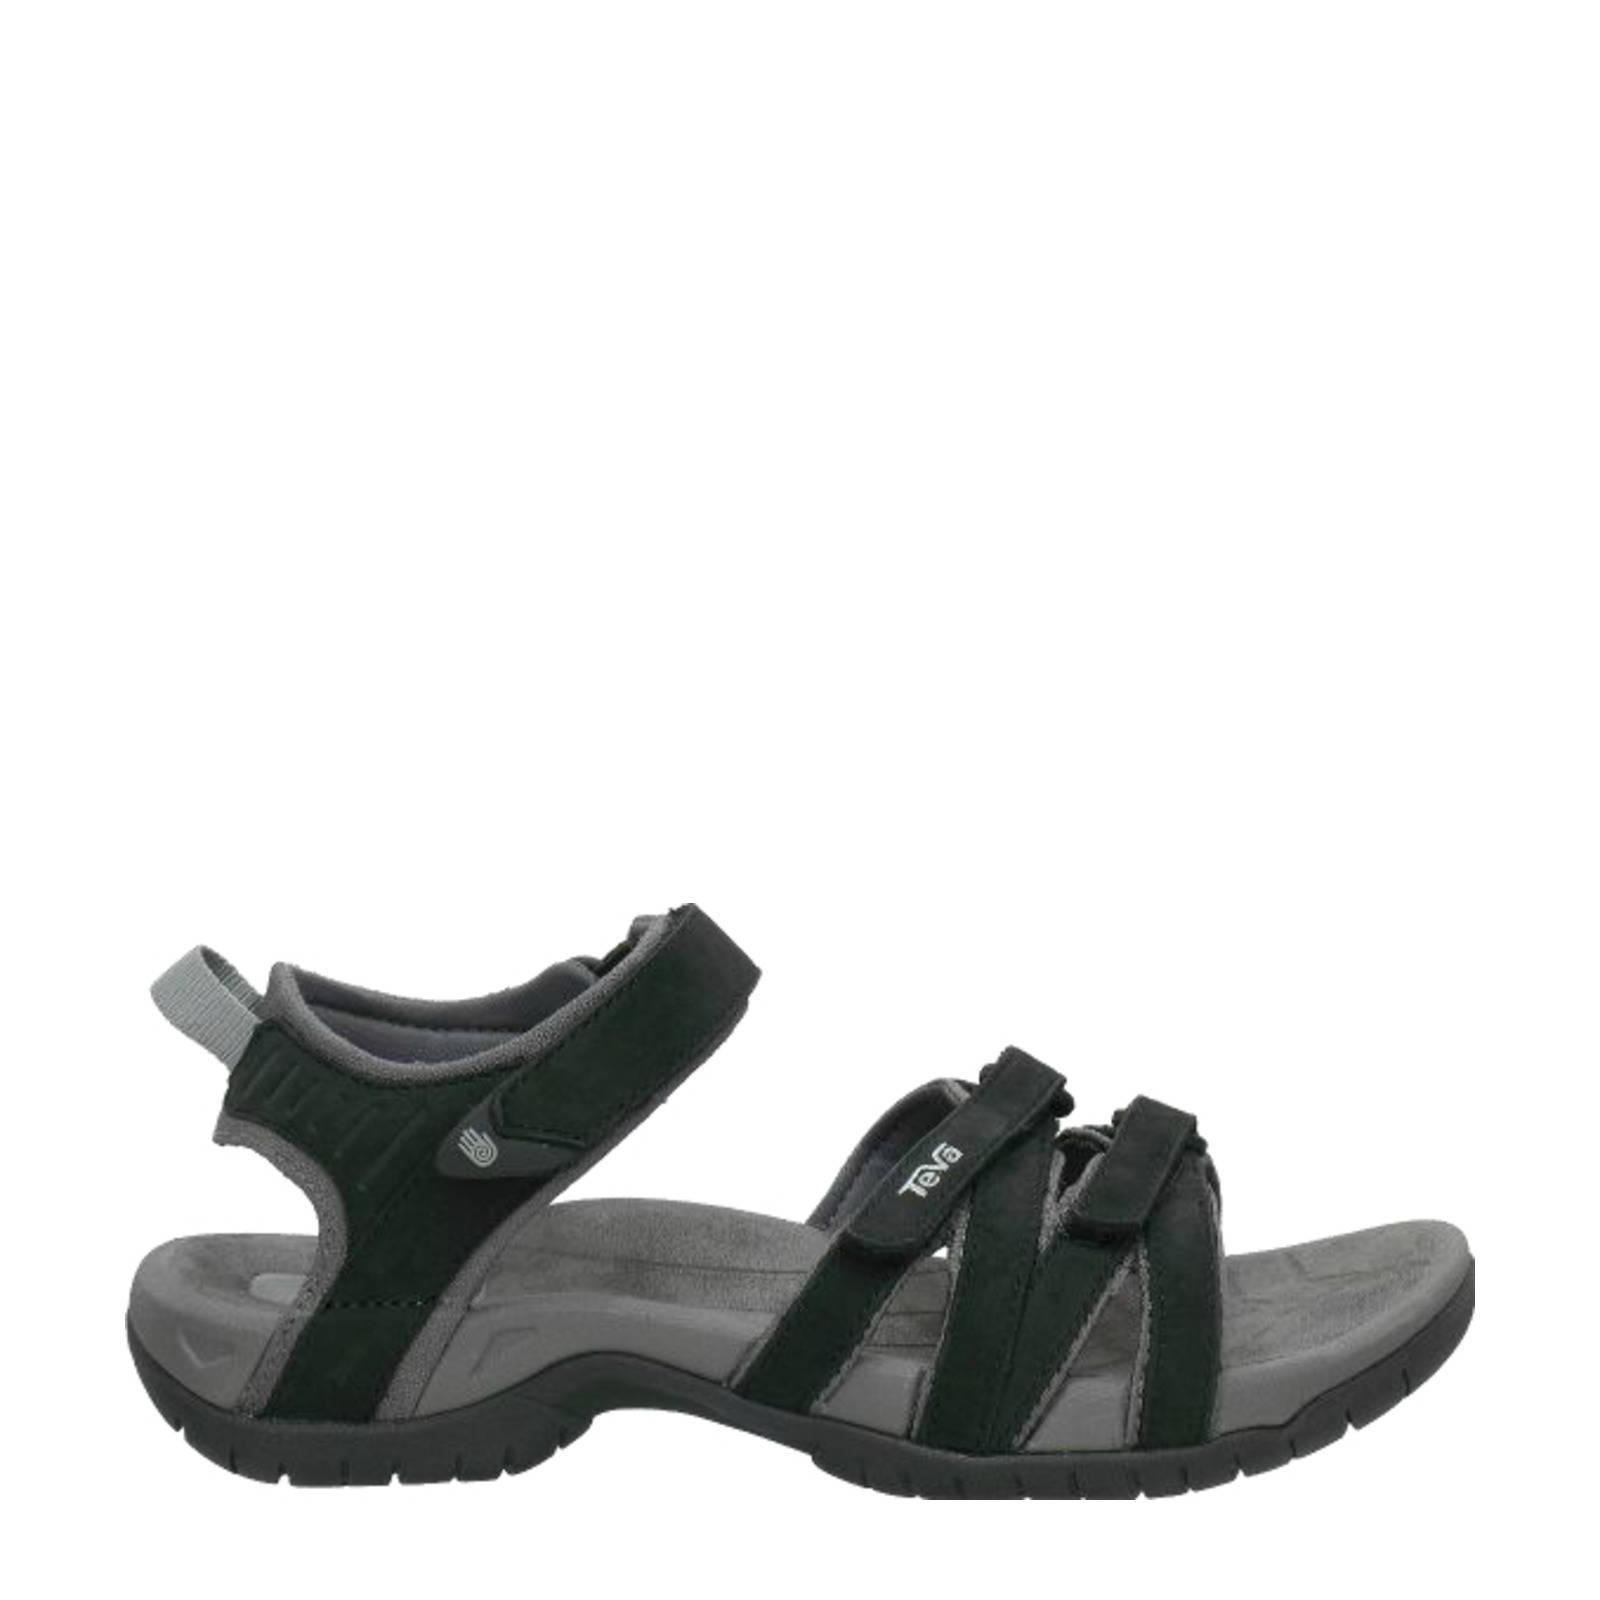 Teva Tirra Leather Sandaal Dames Zwart online kopen